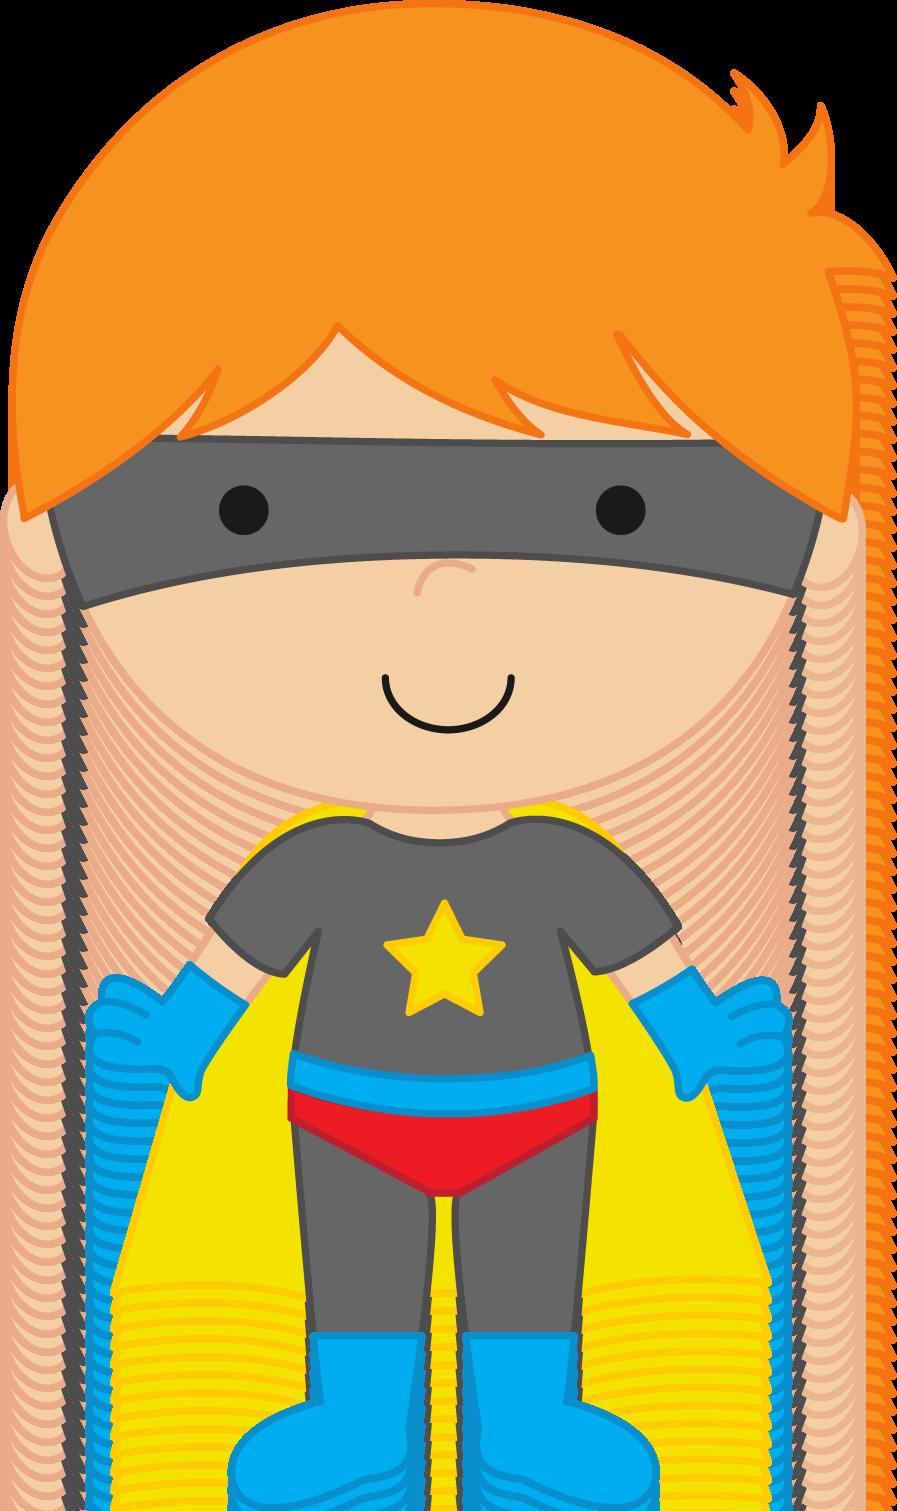 Generic super boy and super girl clipart svg stock Super boy clipart - ClipartFox svg stock